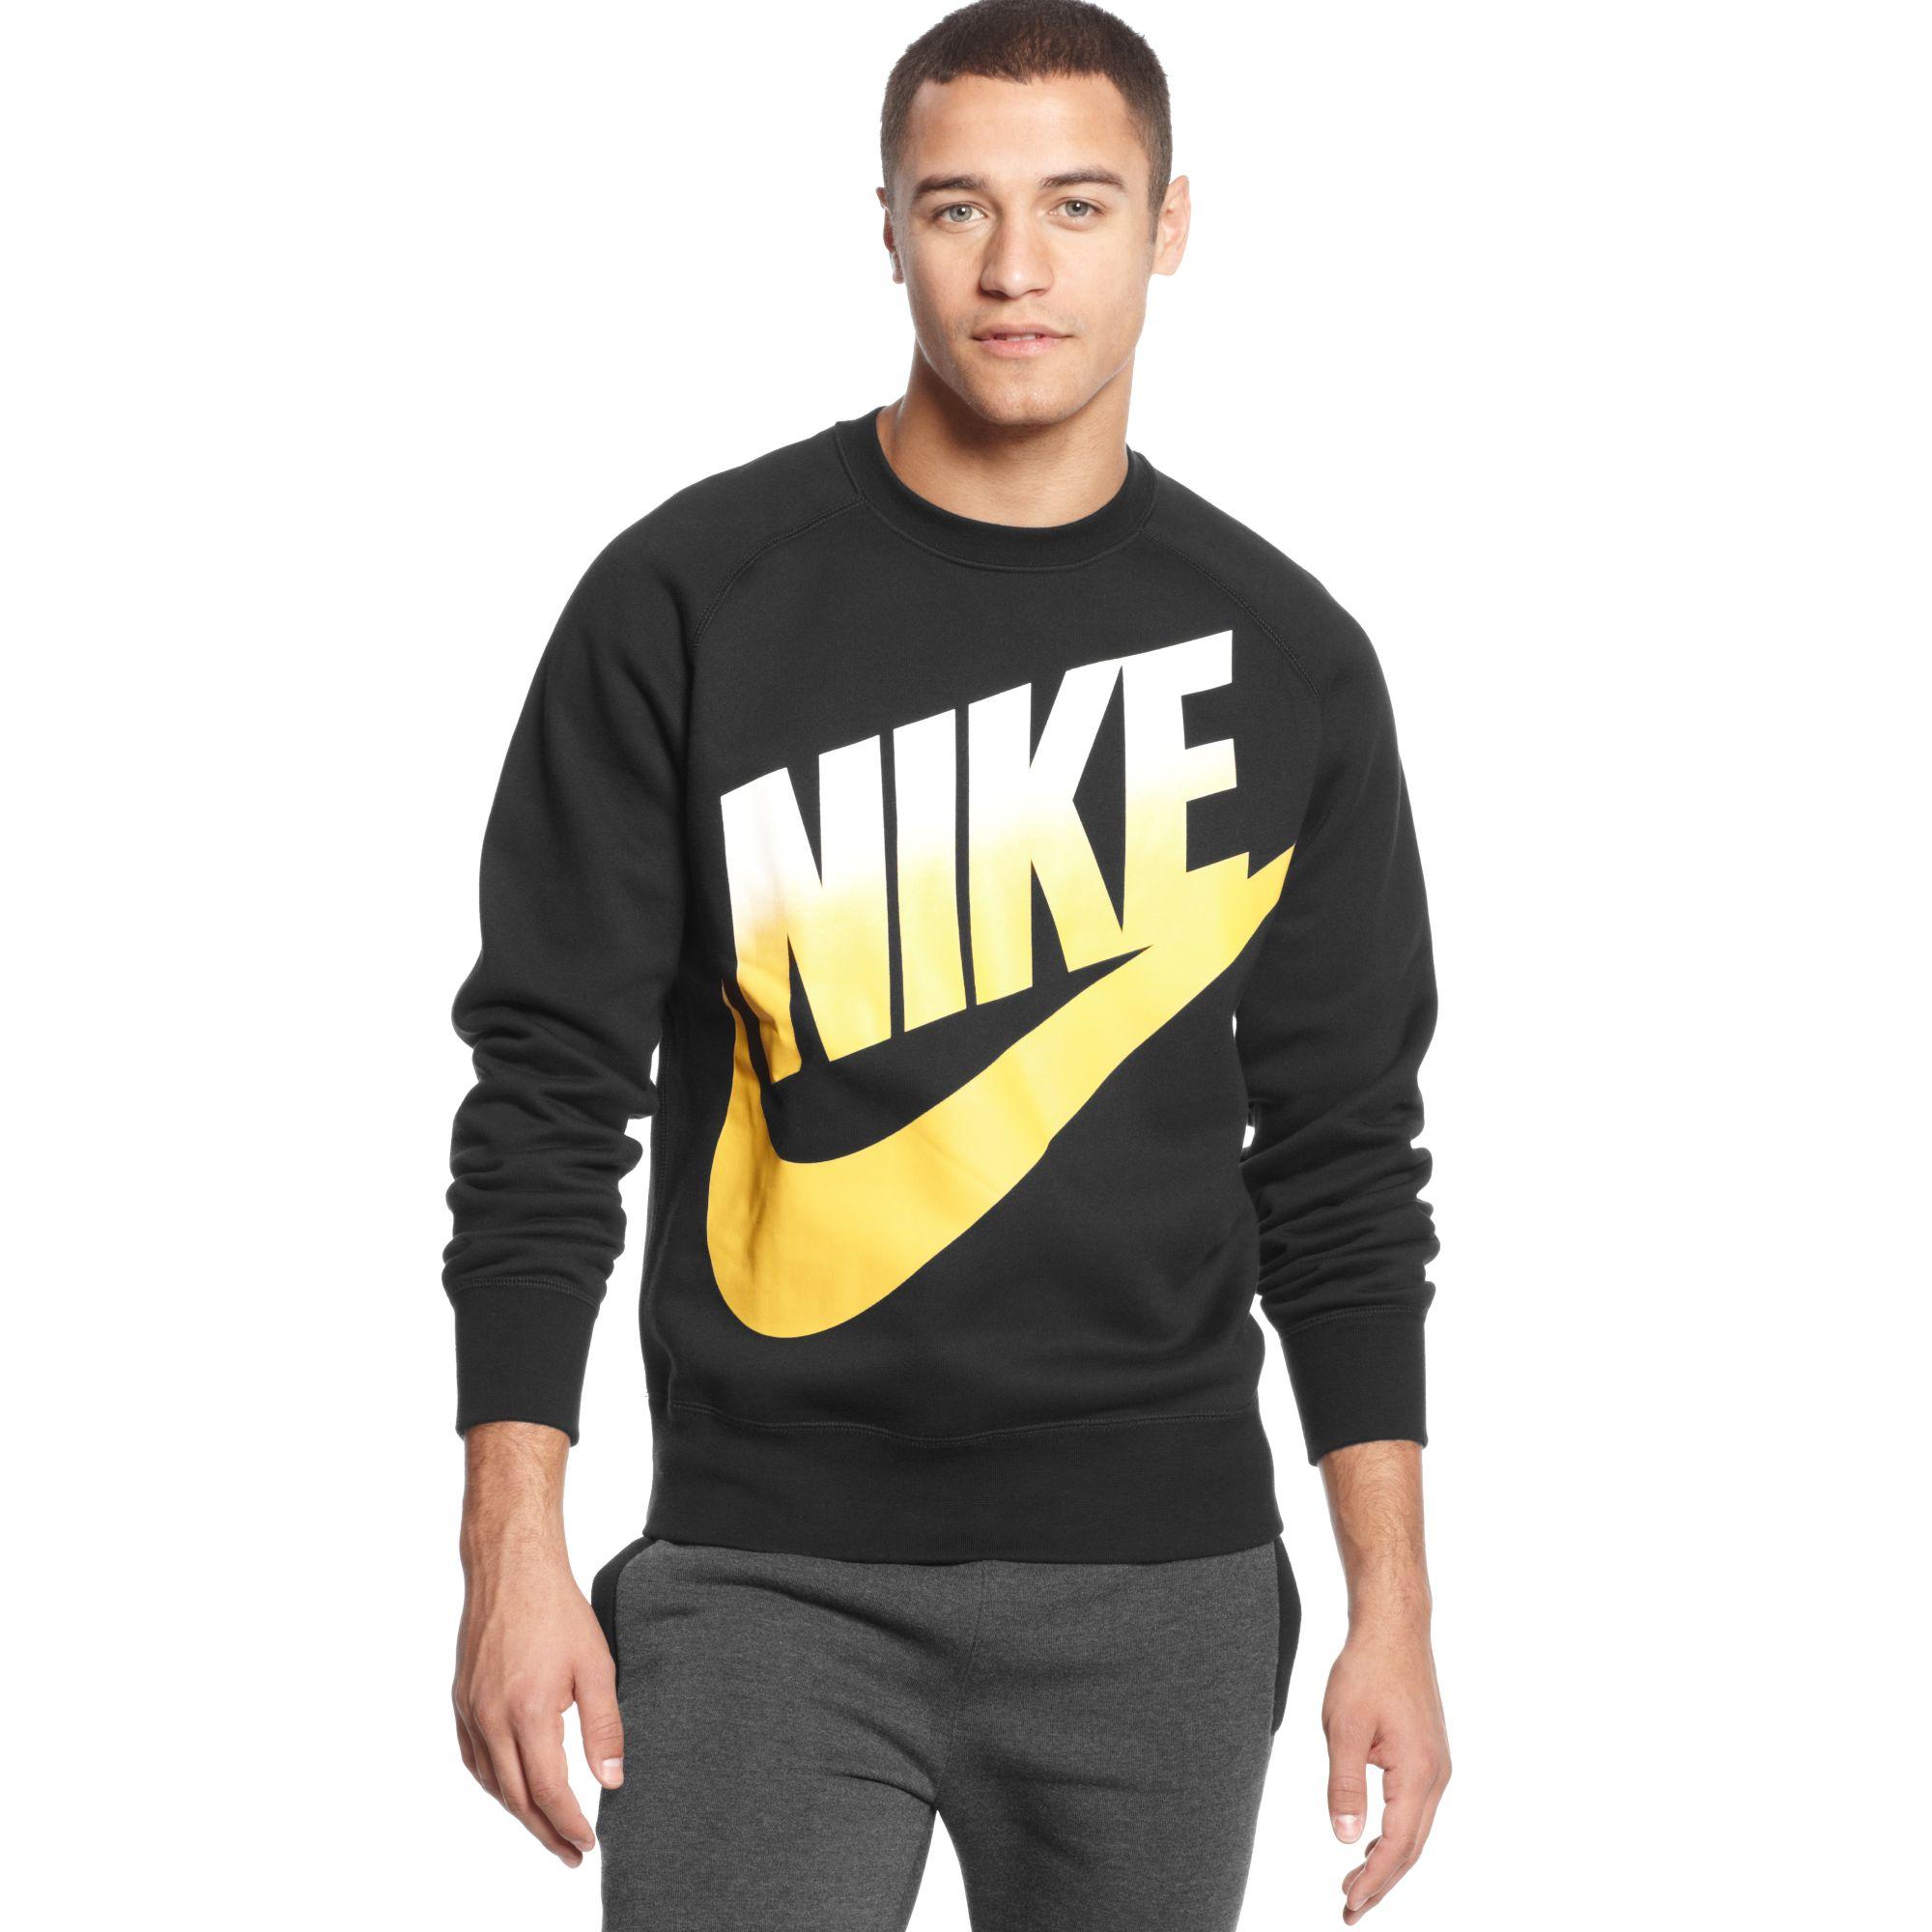 In Diamond Lyst Nike Black Sweatshirt Crewneck Turf Men For vvUwx a9c9502fd